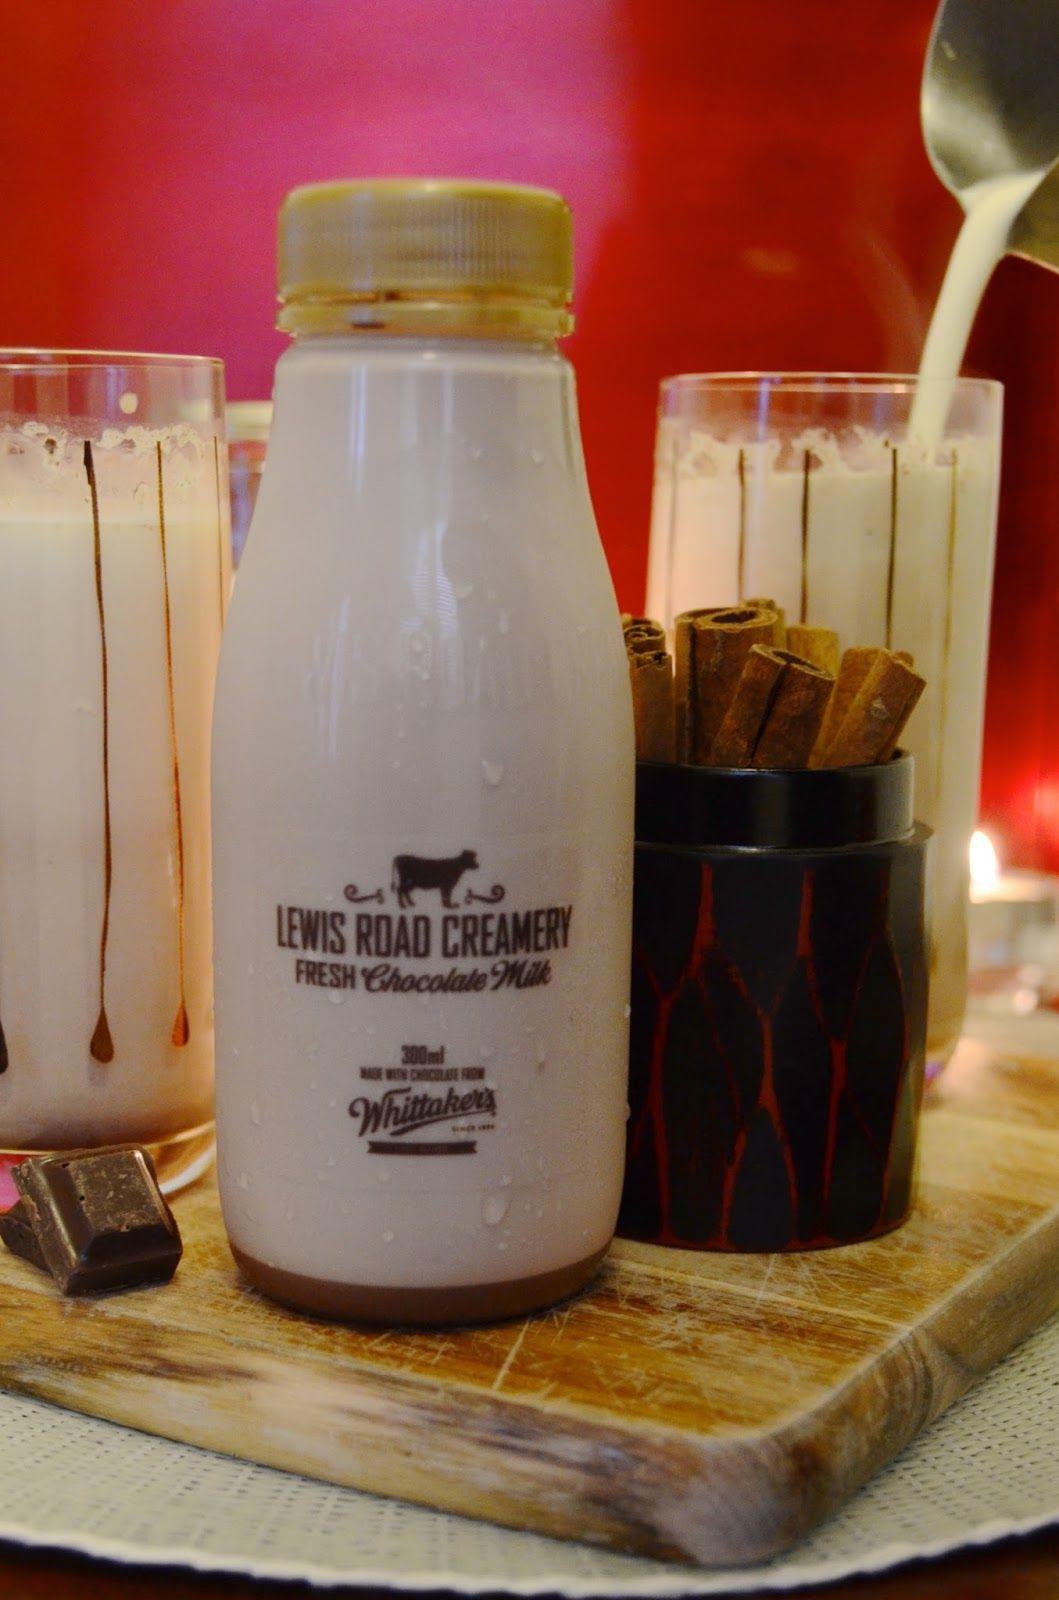 Hot Cocoa Brandy Alexander With Lewis Road Creamery Chocolate Milk